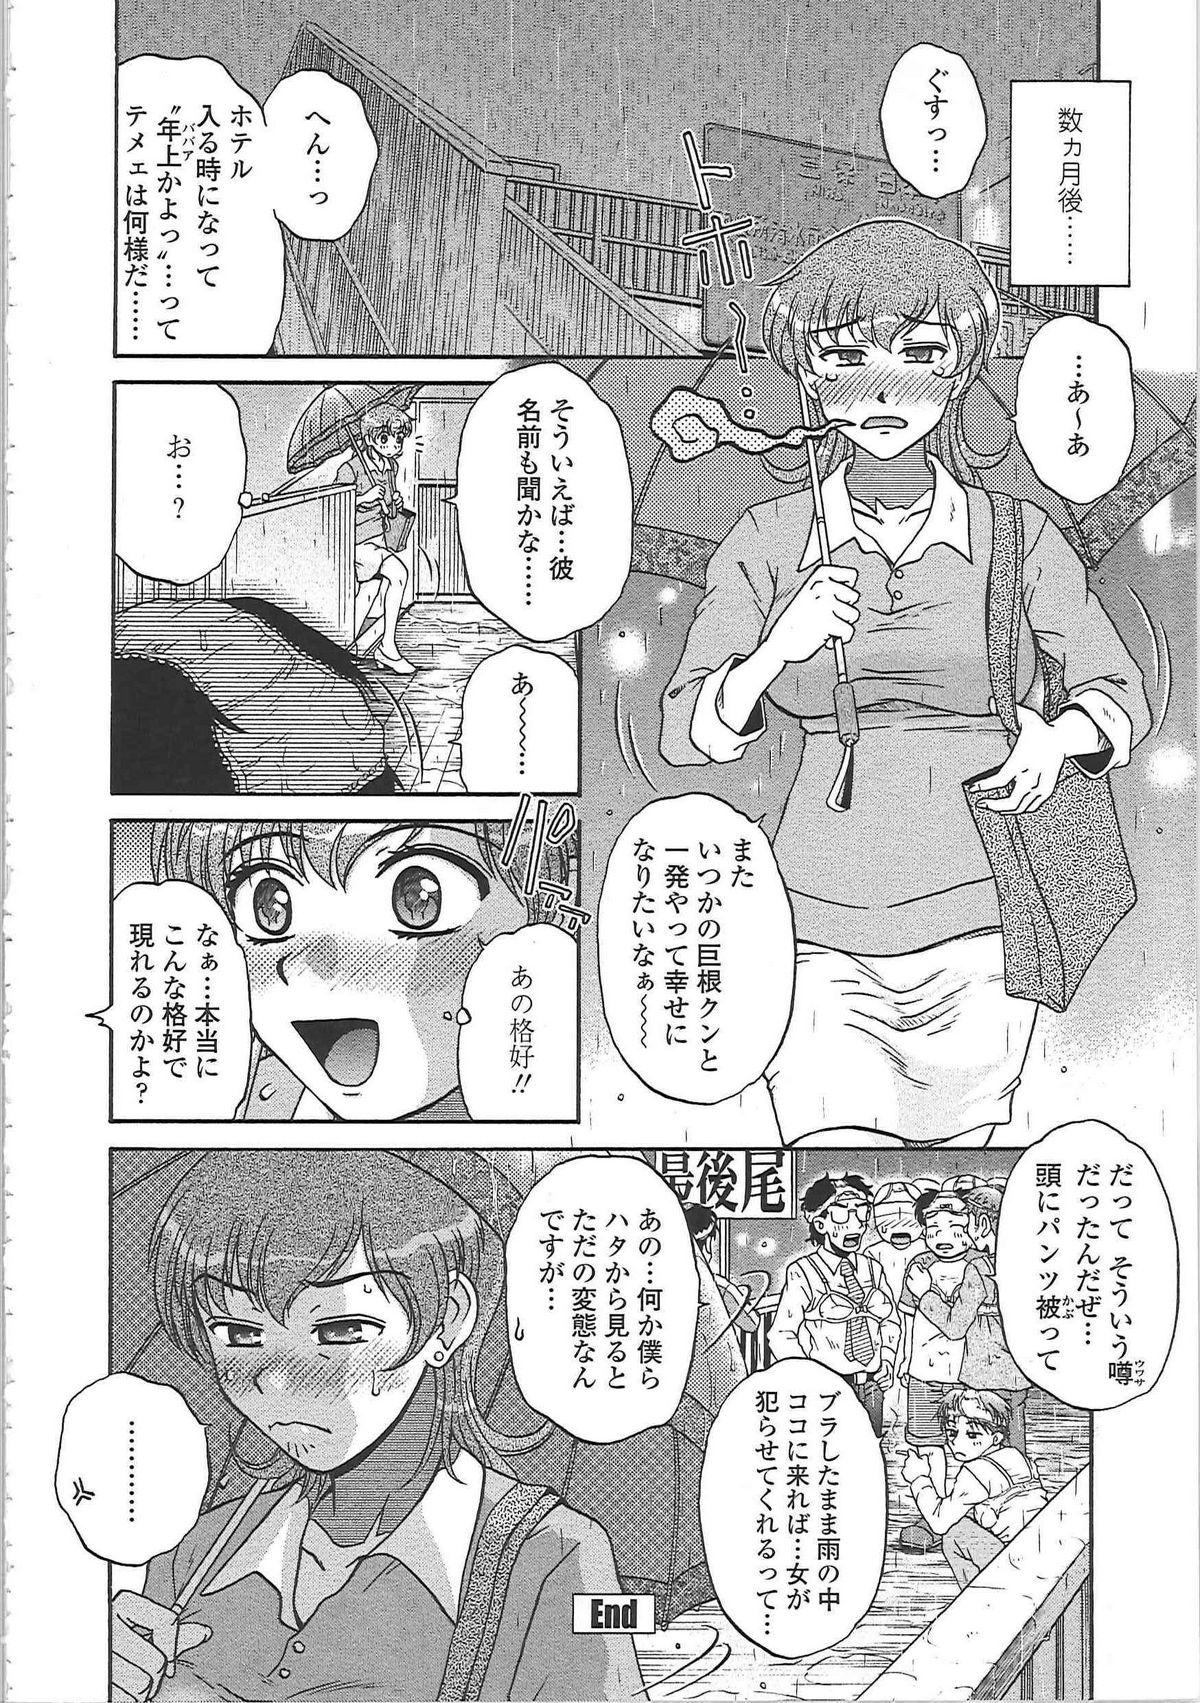 Nikuzuma Tsuushin - Erotic Wife Communication 162